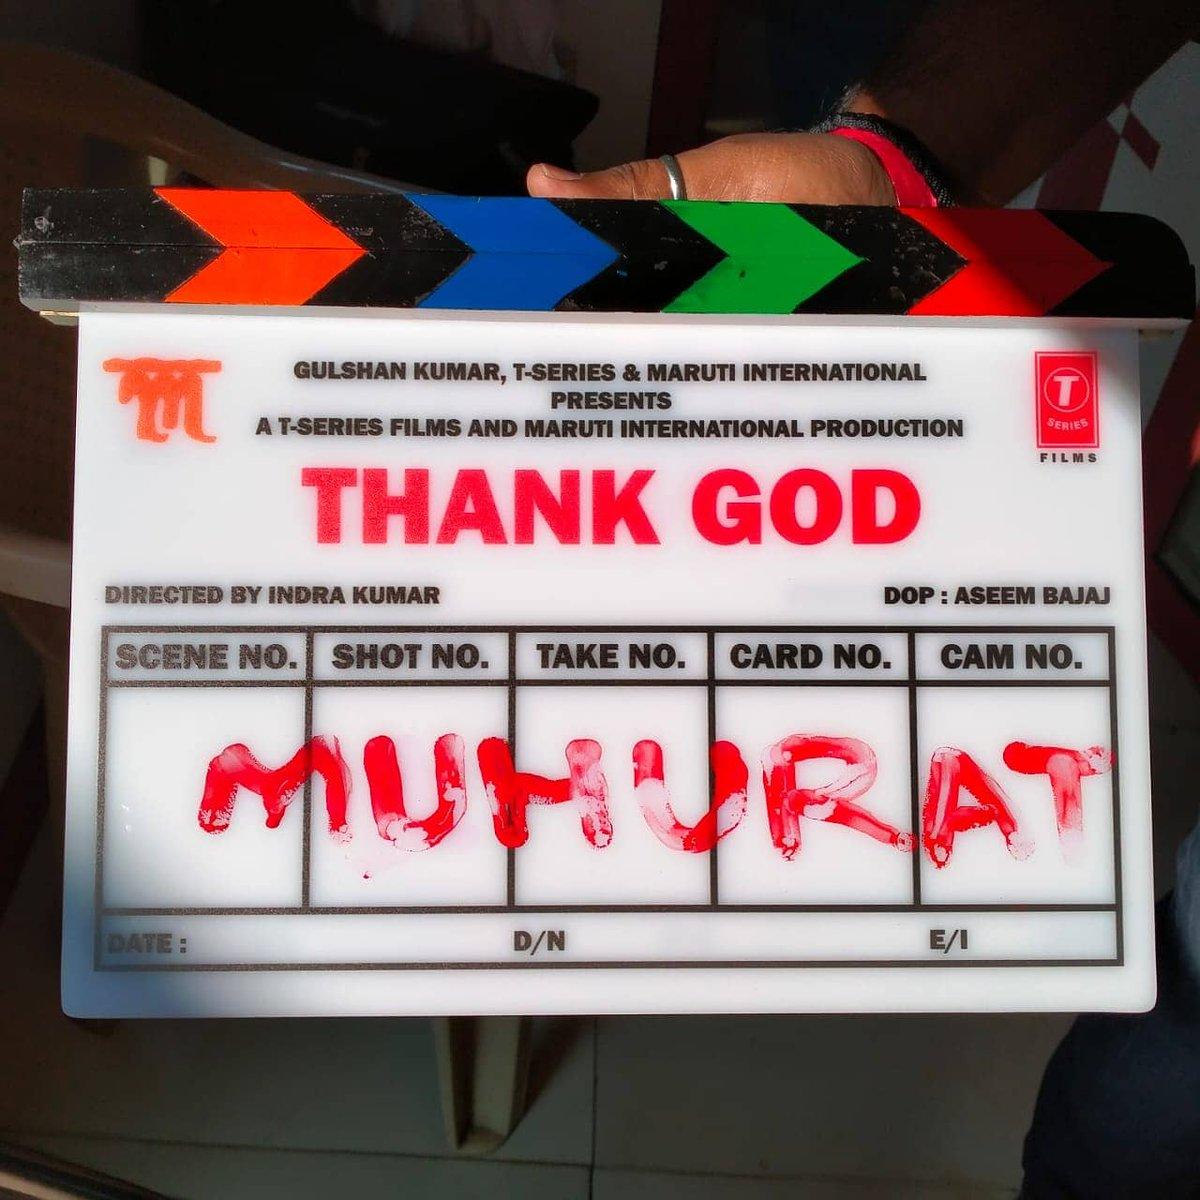 Boss #AjayDevgn Next movie #ThankGod shoot begins today in Mumbai!   @ajaydevgn @SidMalhotra @Rakulpreet @Indra_kumar_9 #BhushanKumar #KrishanKumar #AshokThakeria @SunirKheterpal @DeepakMukut @MunnangiBalu @anandpandit63 #MarkandAdhikari #YashShah @TSeries